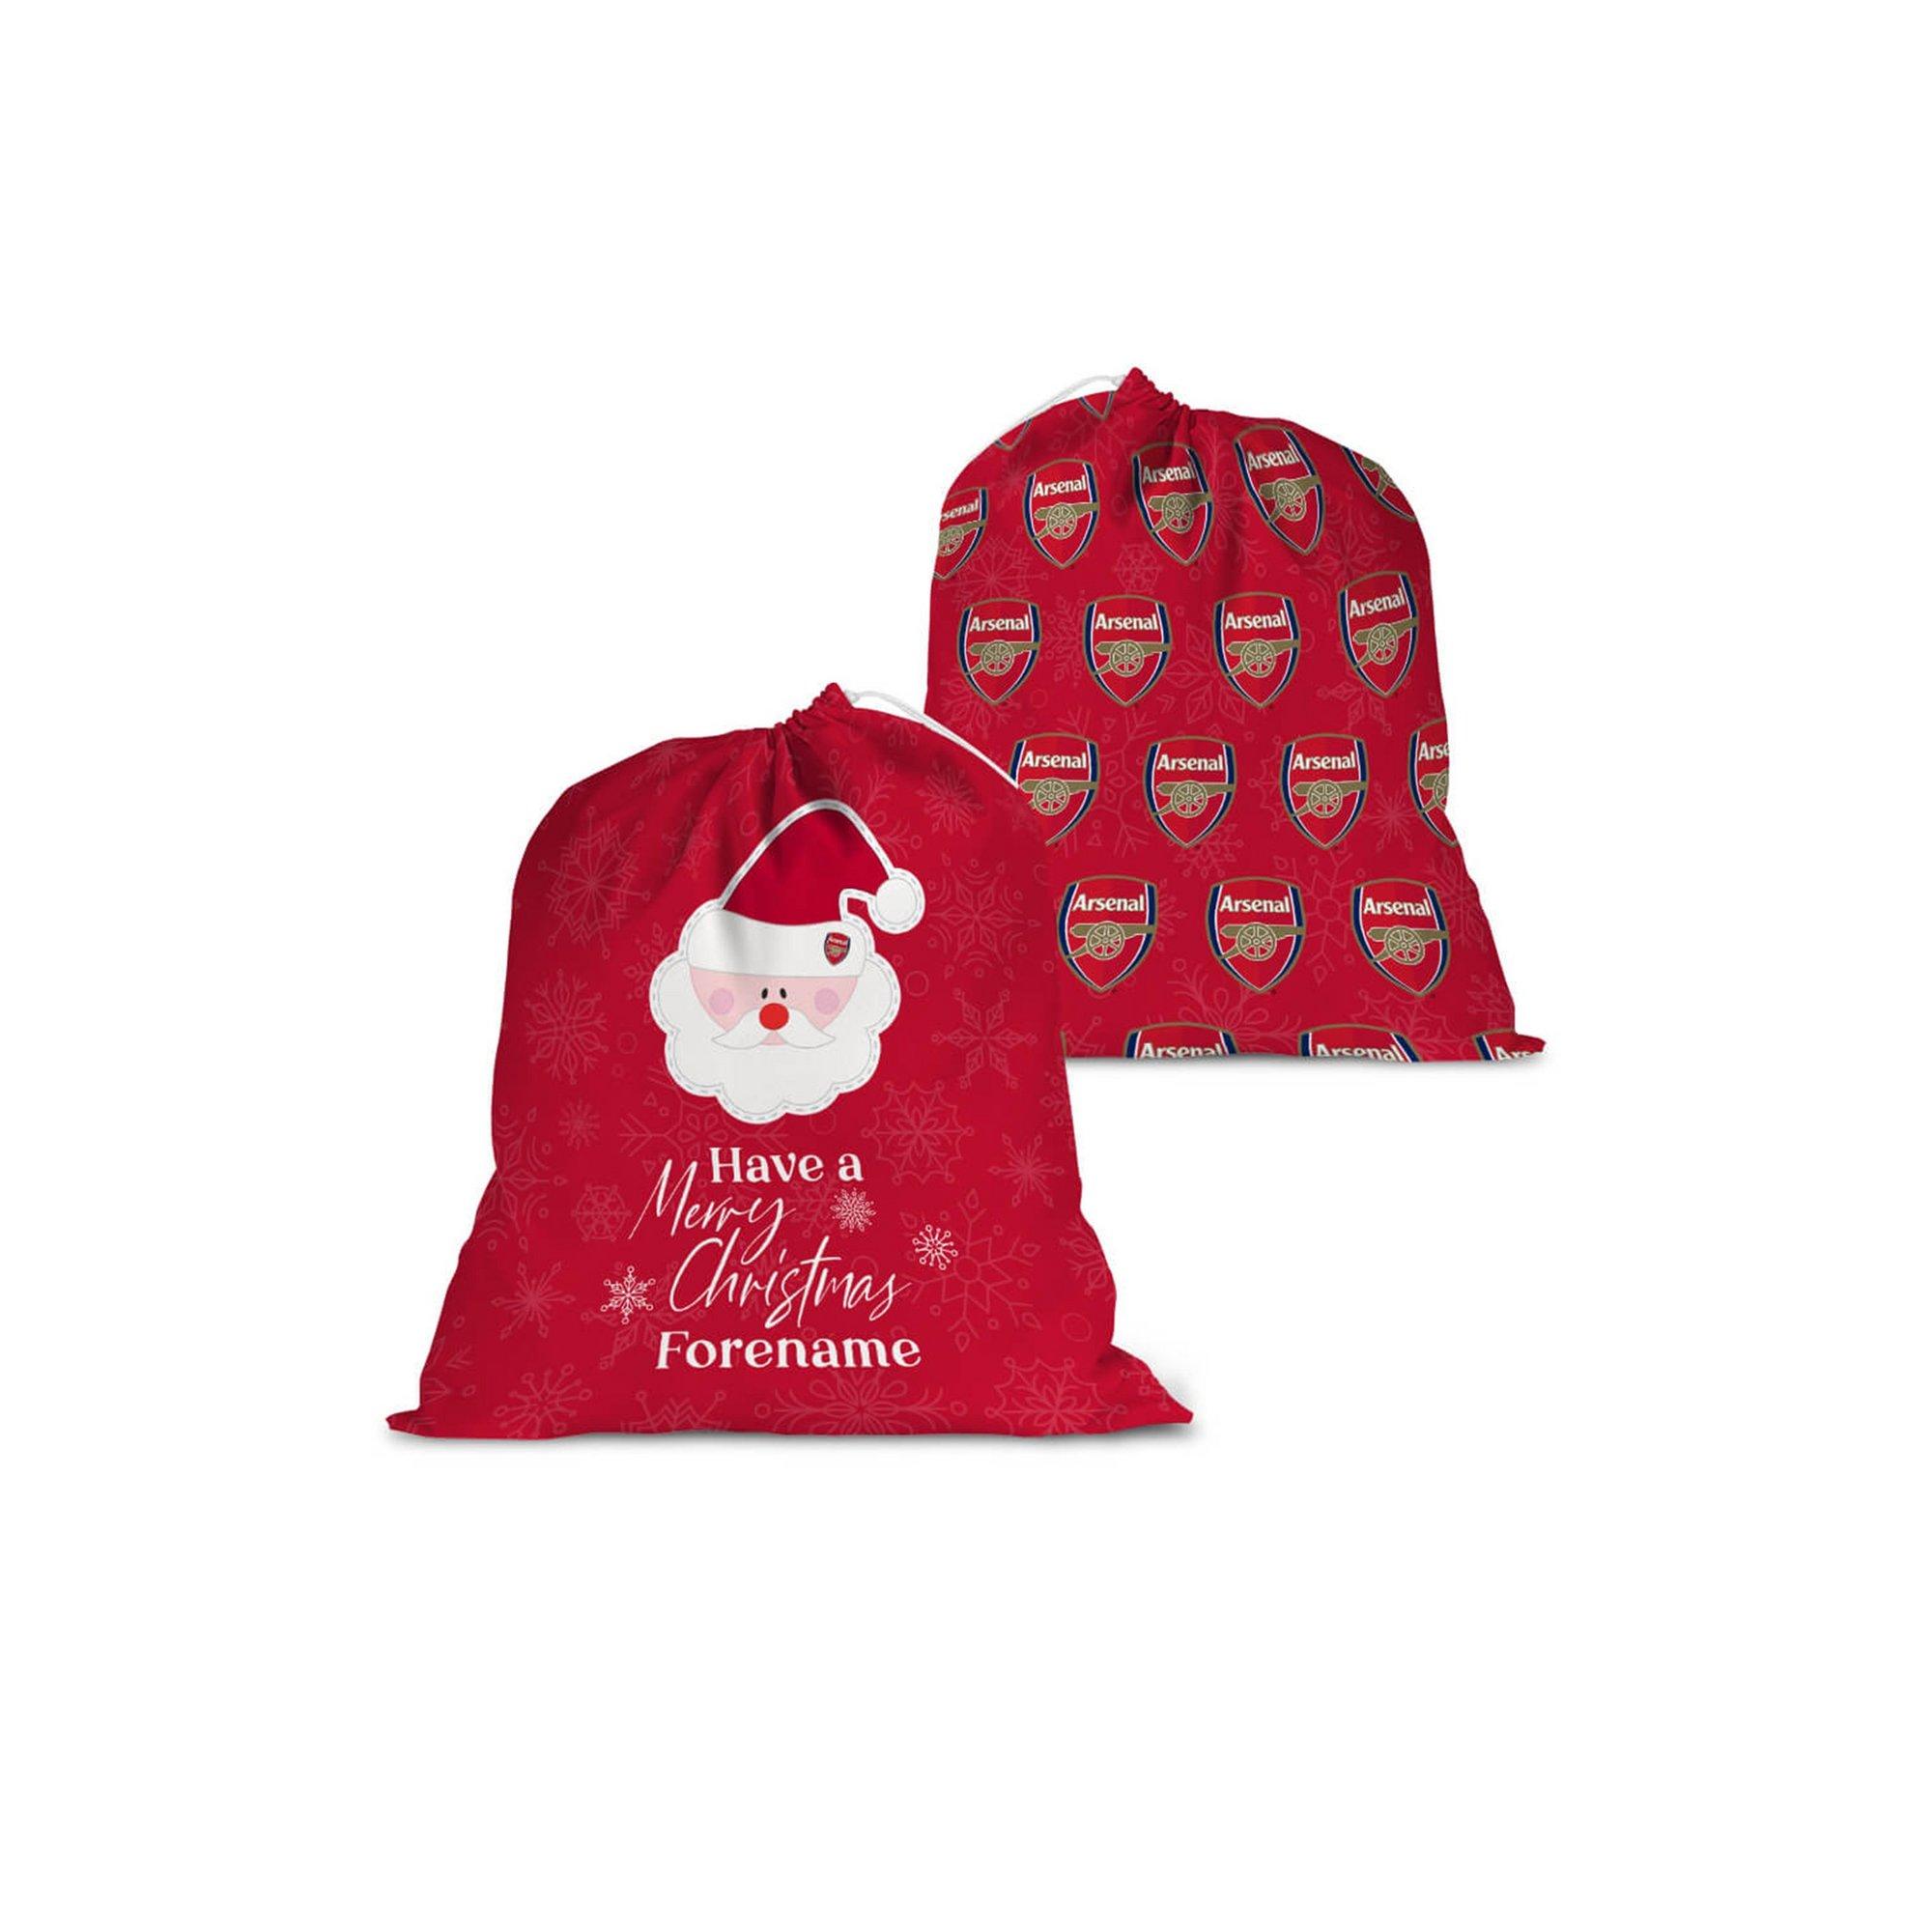 Image of Personalised Arsenal FC Merry Christmas Santa Sack